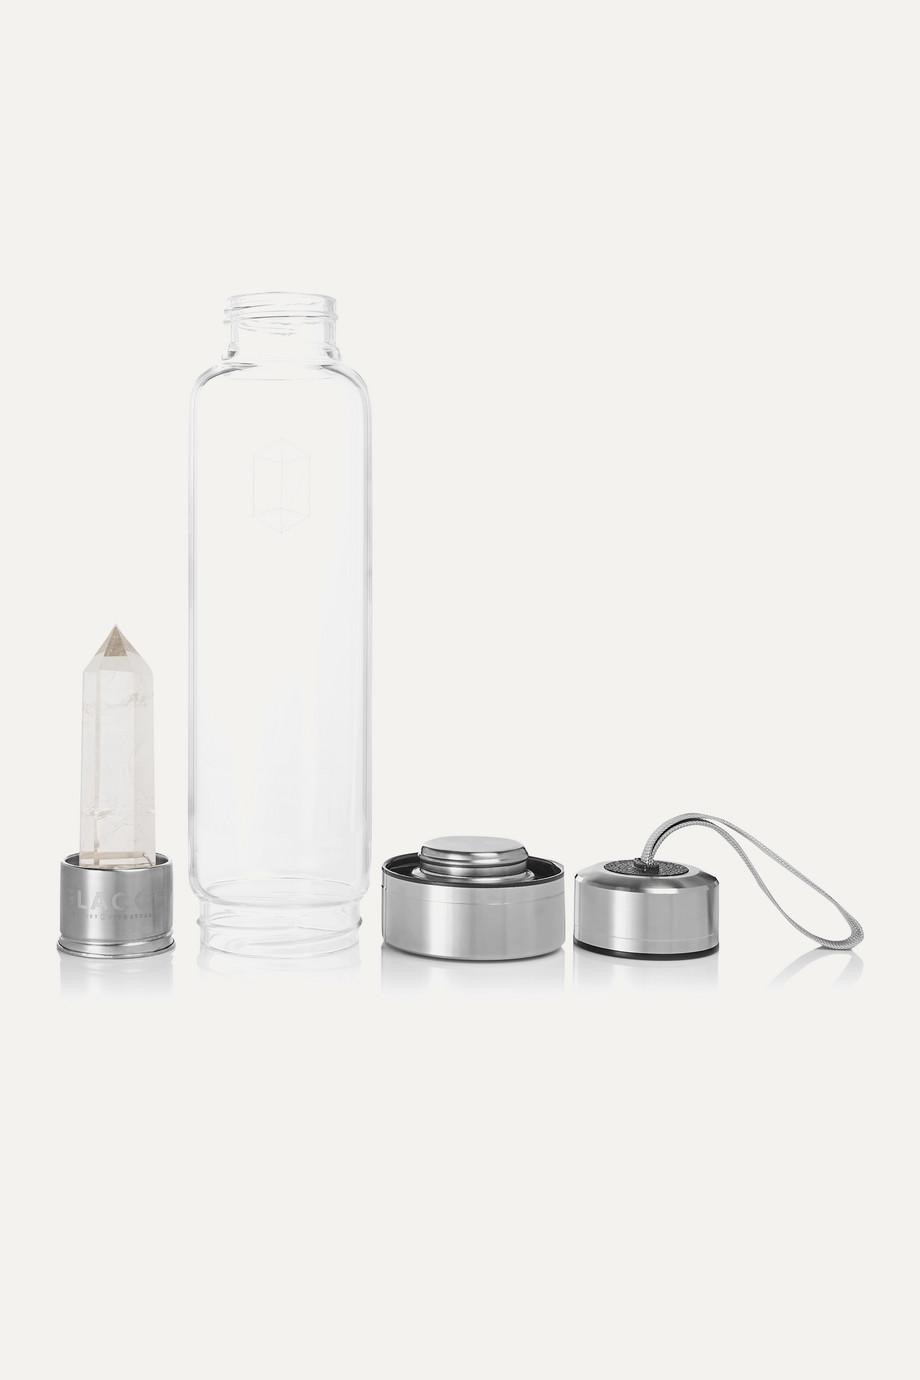 GLACCE Trinkflasche mit Bergkristall